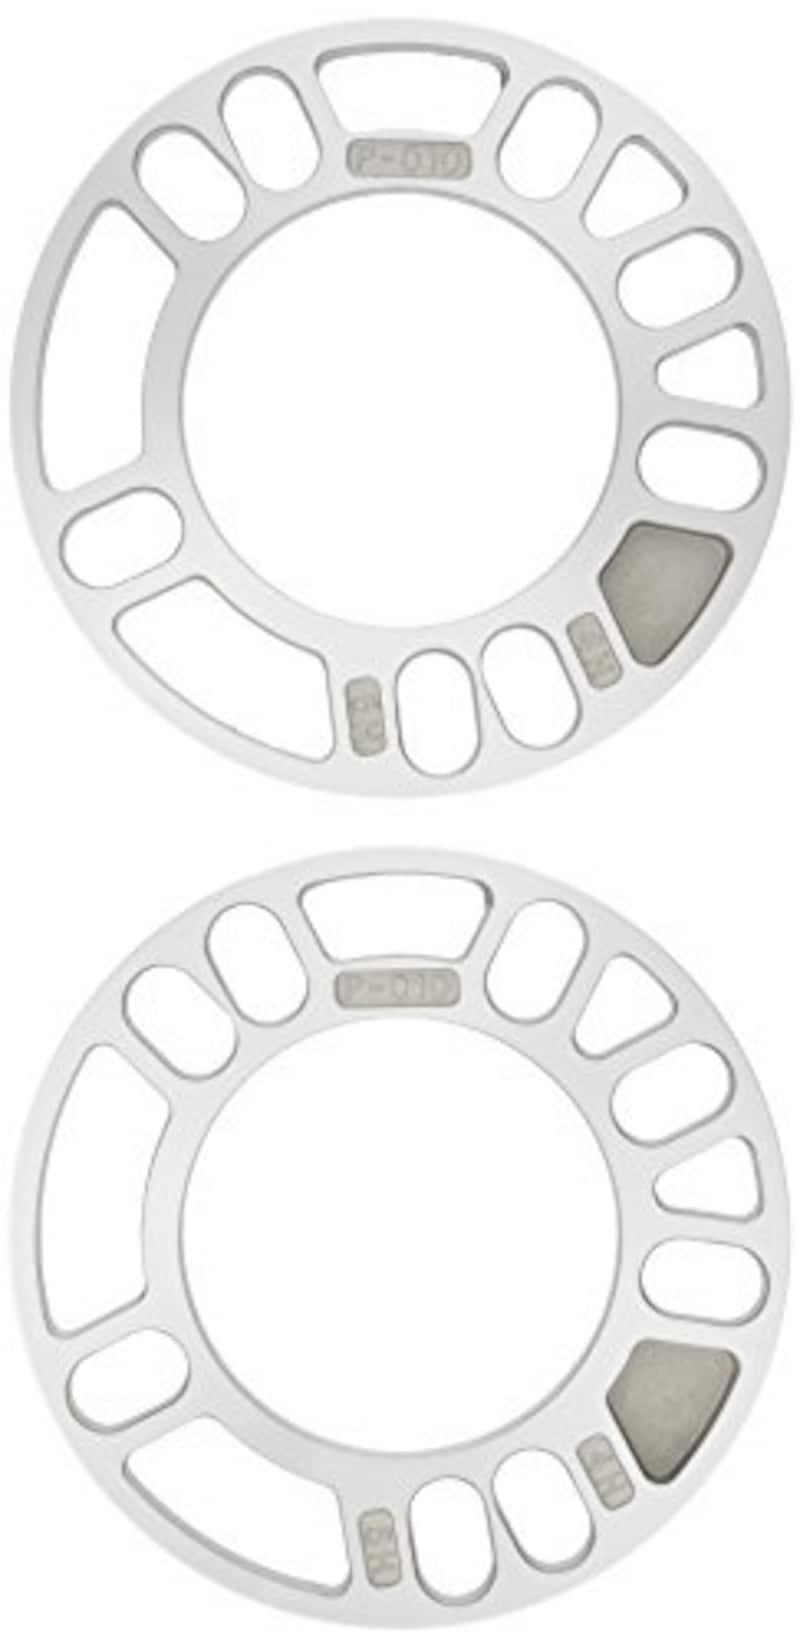 協栄産業,Wheel Spacer 10mm 4/5H,P-010-2P